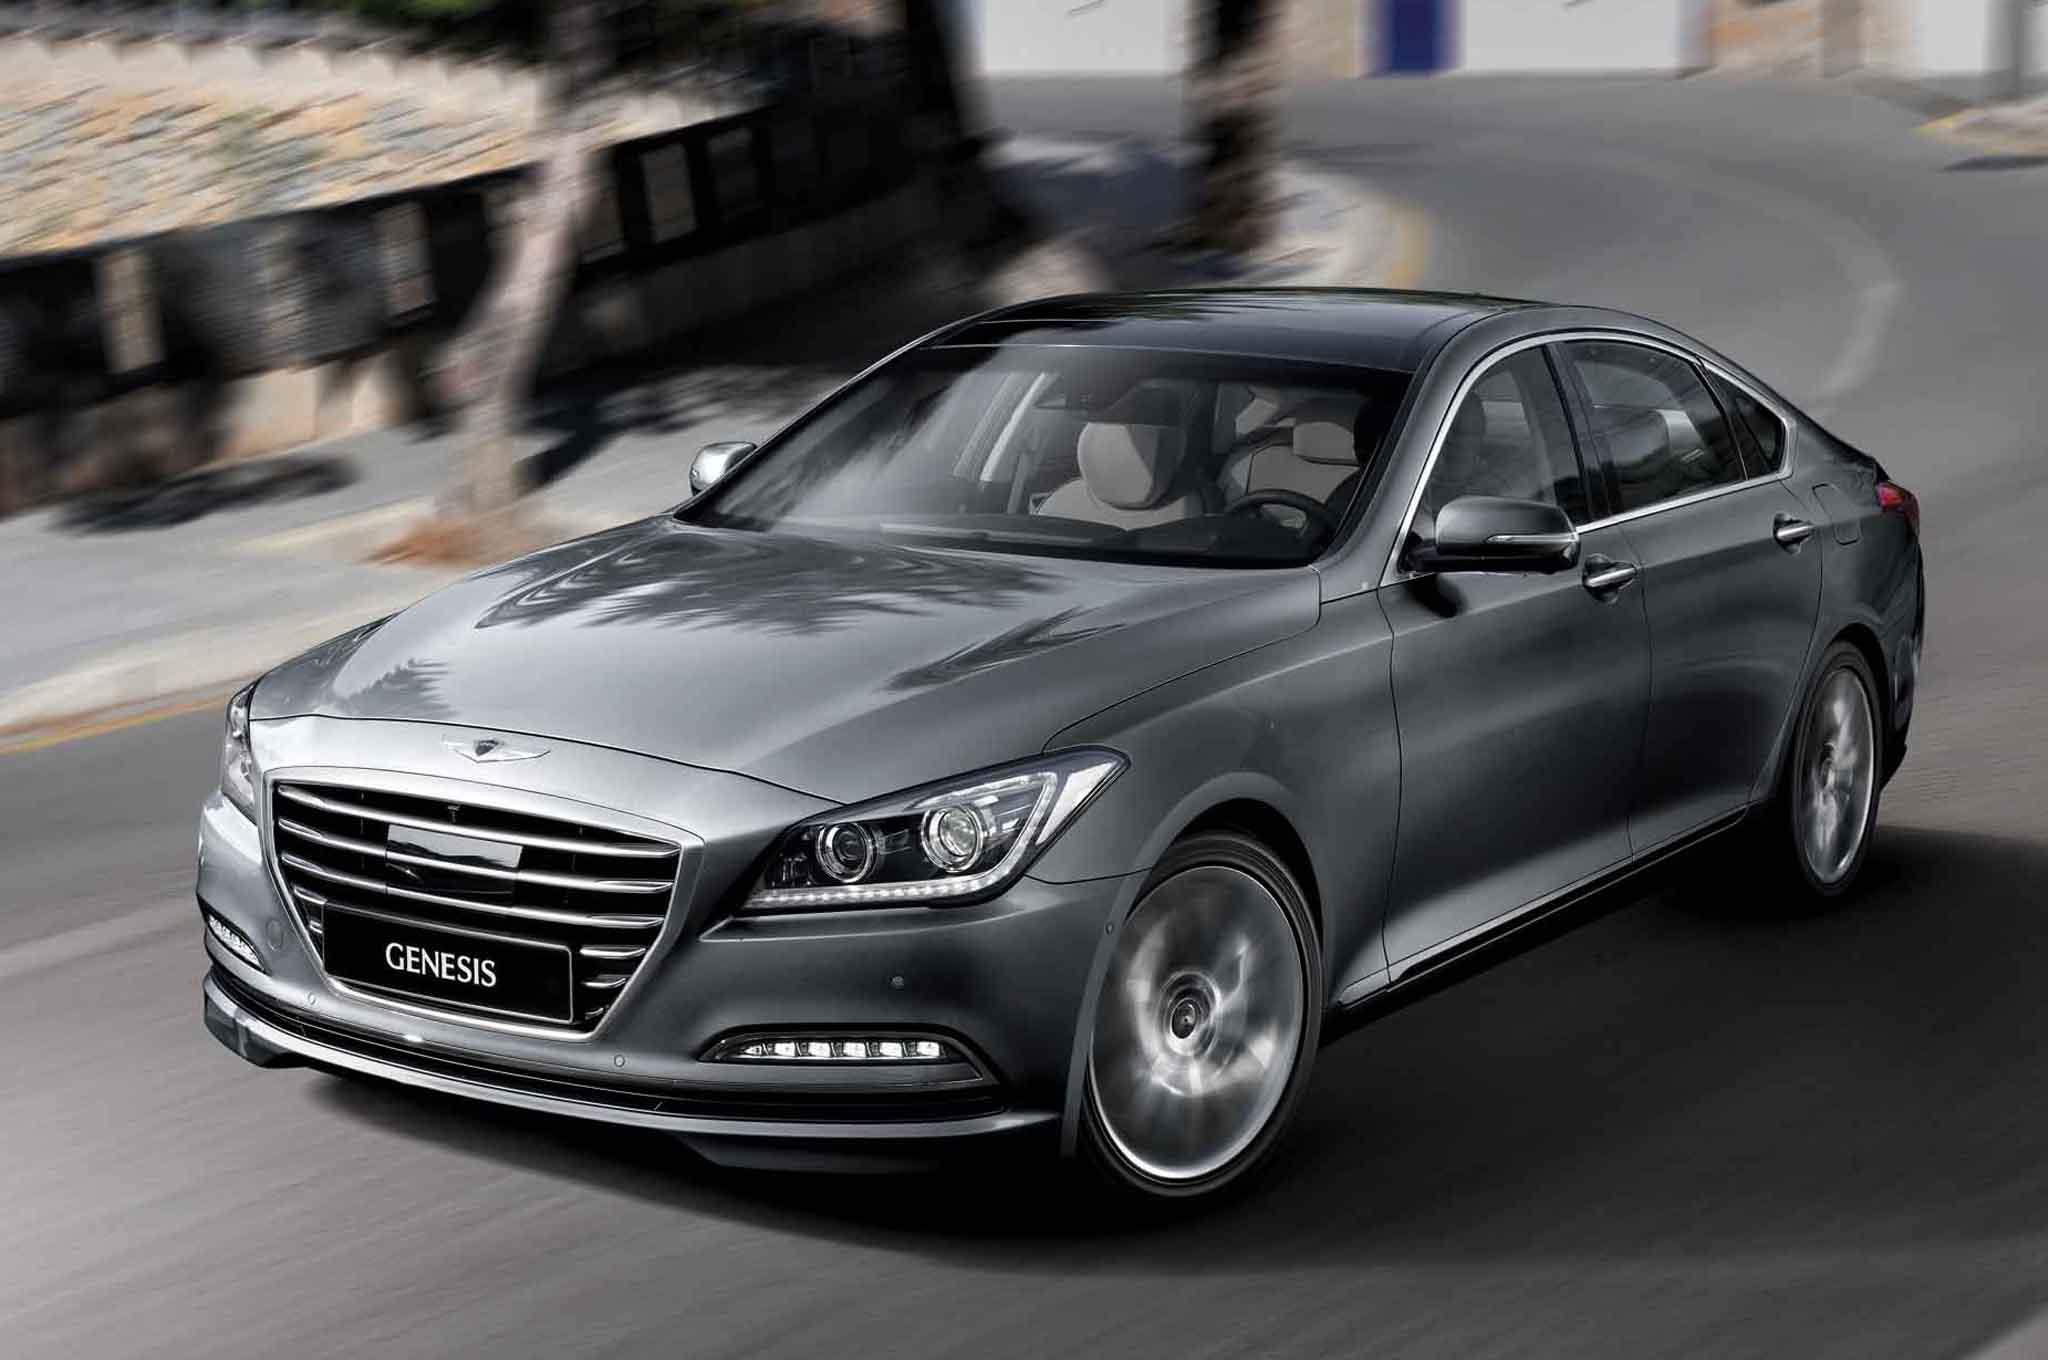 2015 Hyundai Genesis Front Three Quarter 021